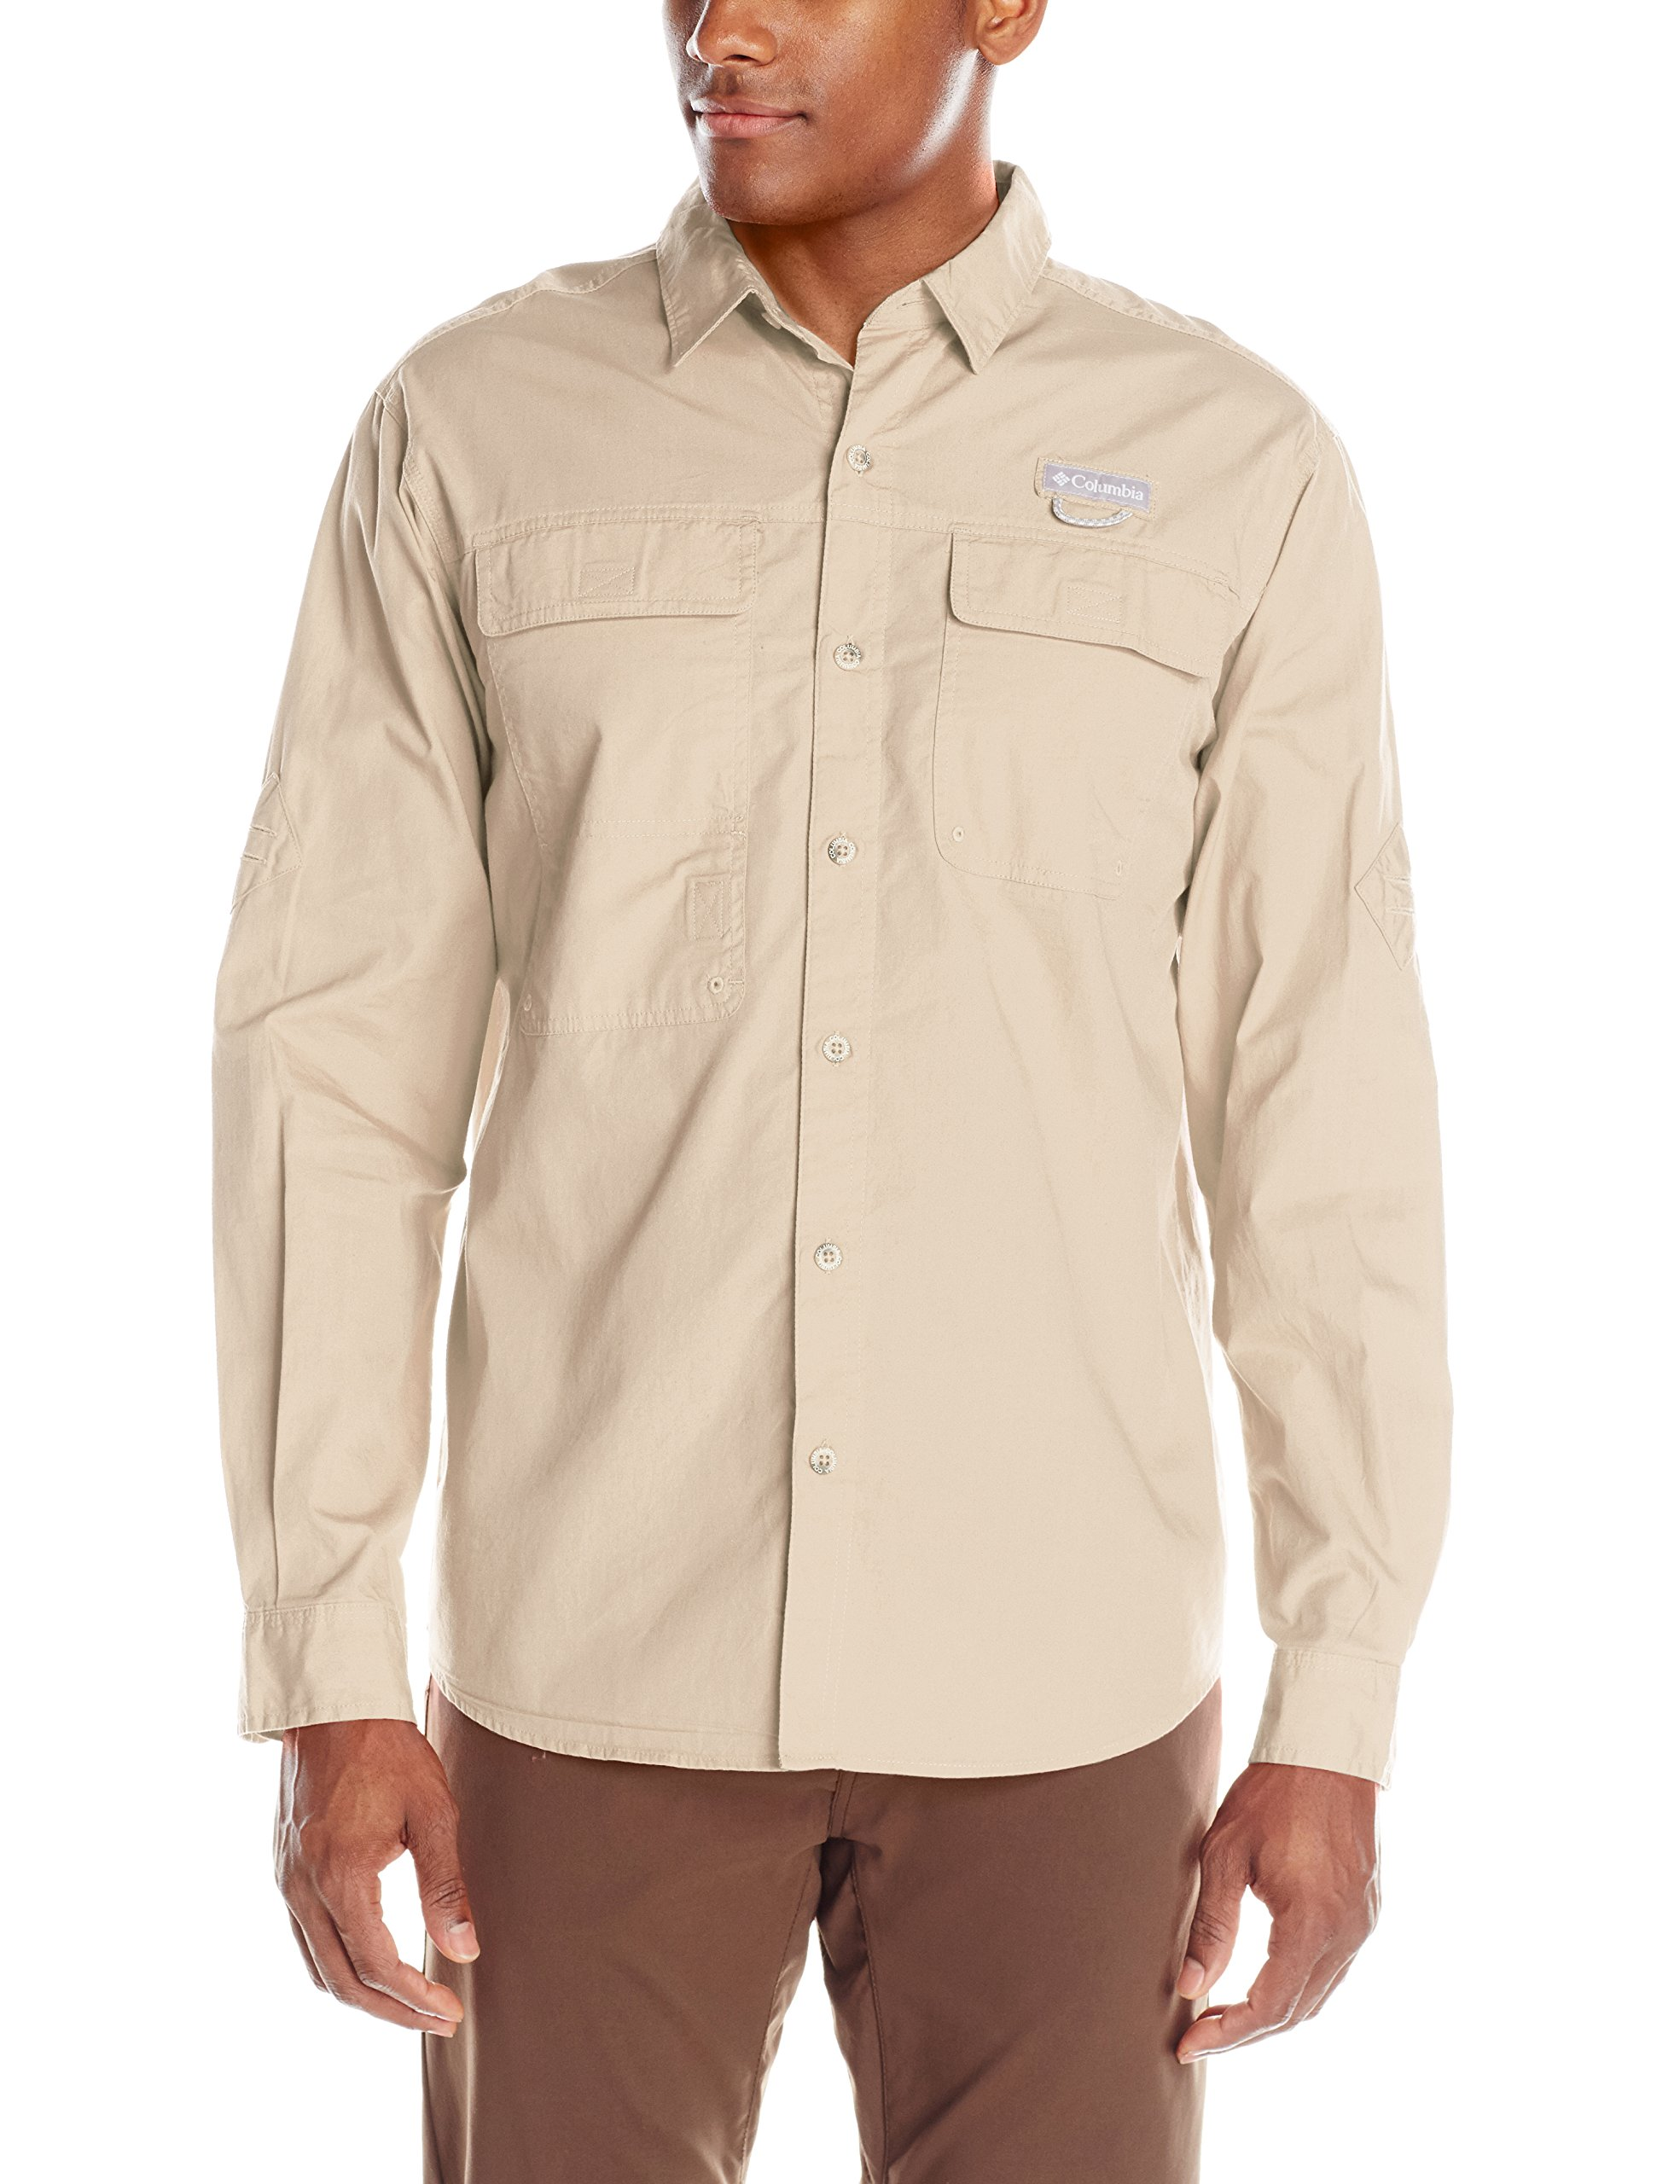 Columbia SPORTSWEAR 男式 trailhead 长袖衬衫